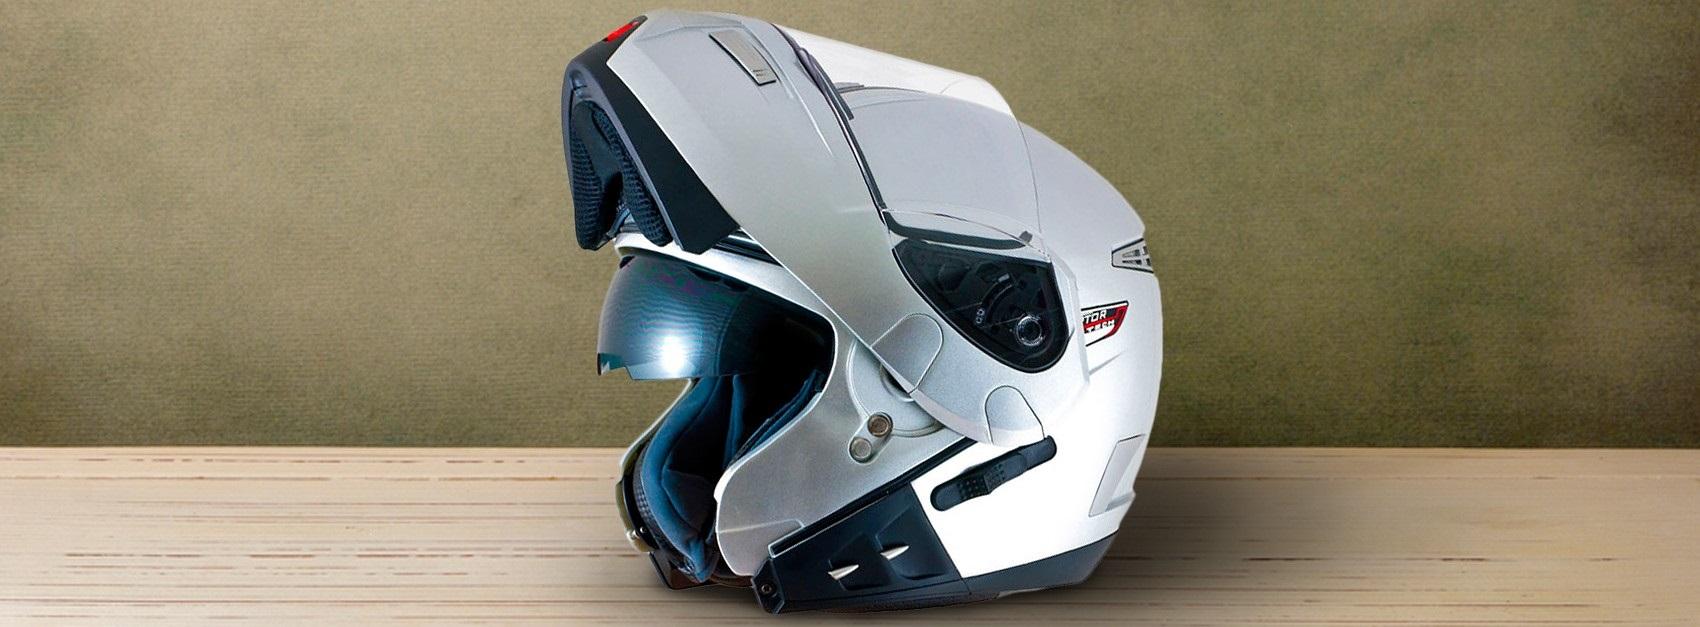 Casco de Moto tipo Jet 26